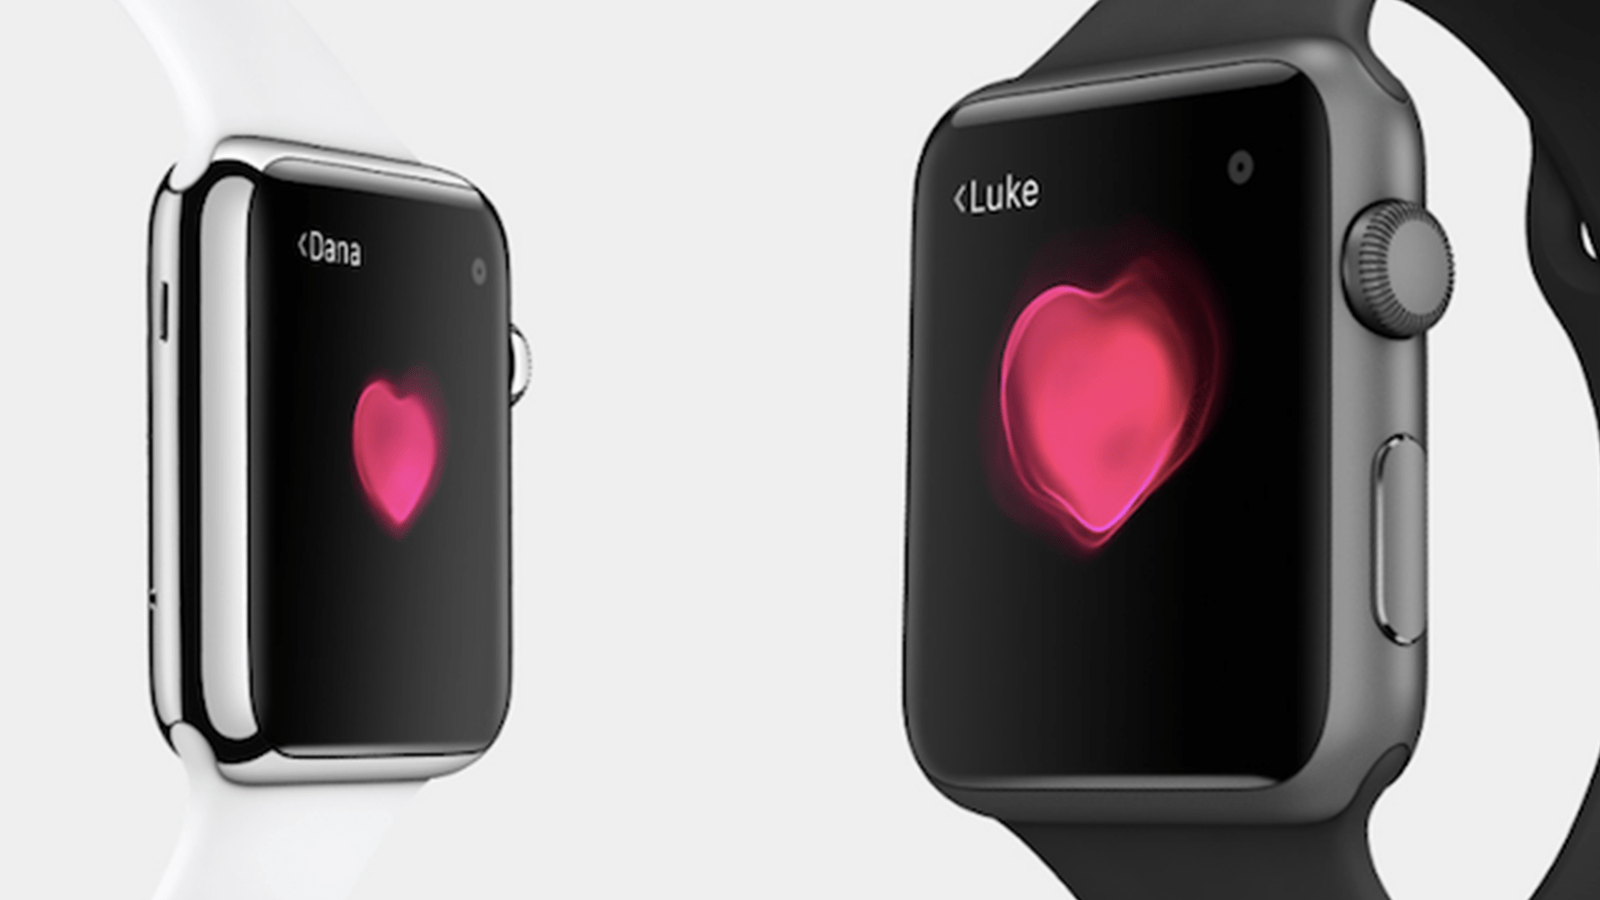 Apple Watch 成功偵測糖尿病 研究員:成功率達85%